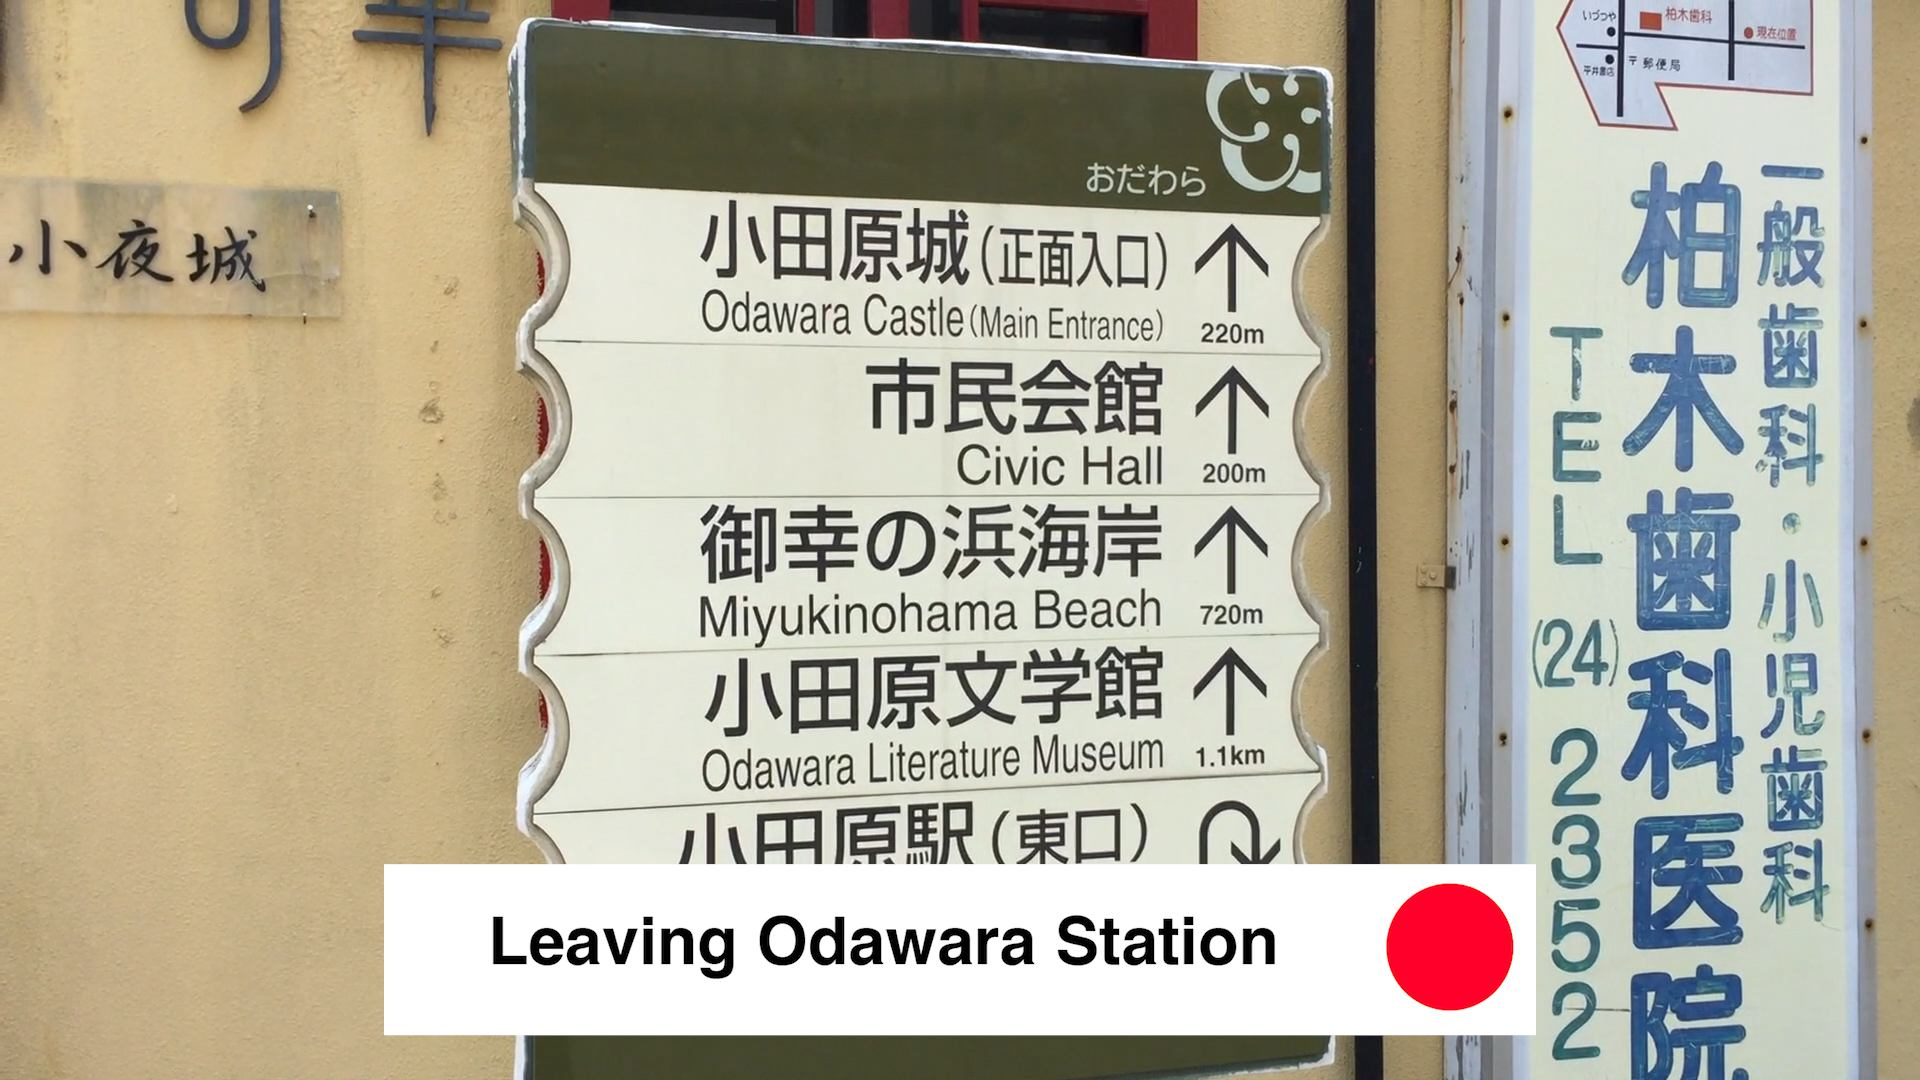 Odawara Station - Odawara Castle Japan Guide Review Video - 9 Reasons To See Odawara Castle Kanagawa Japan 🇯🇵 🏯 🌸